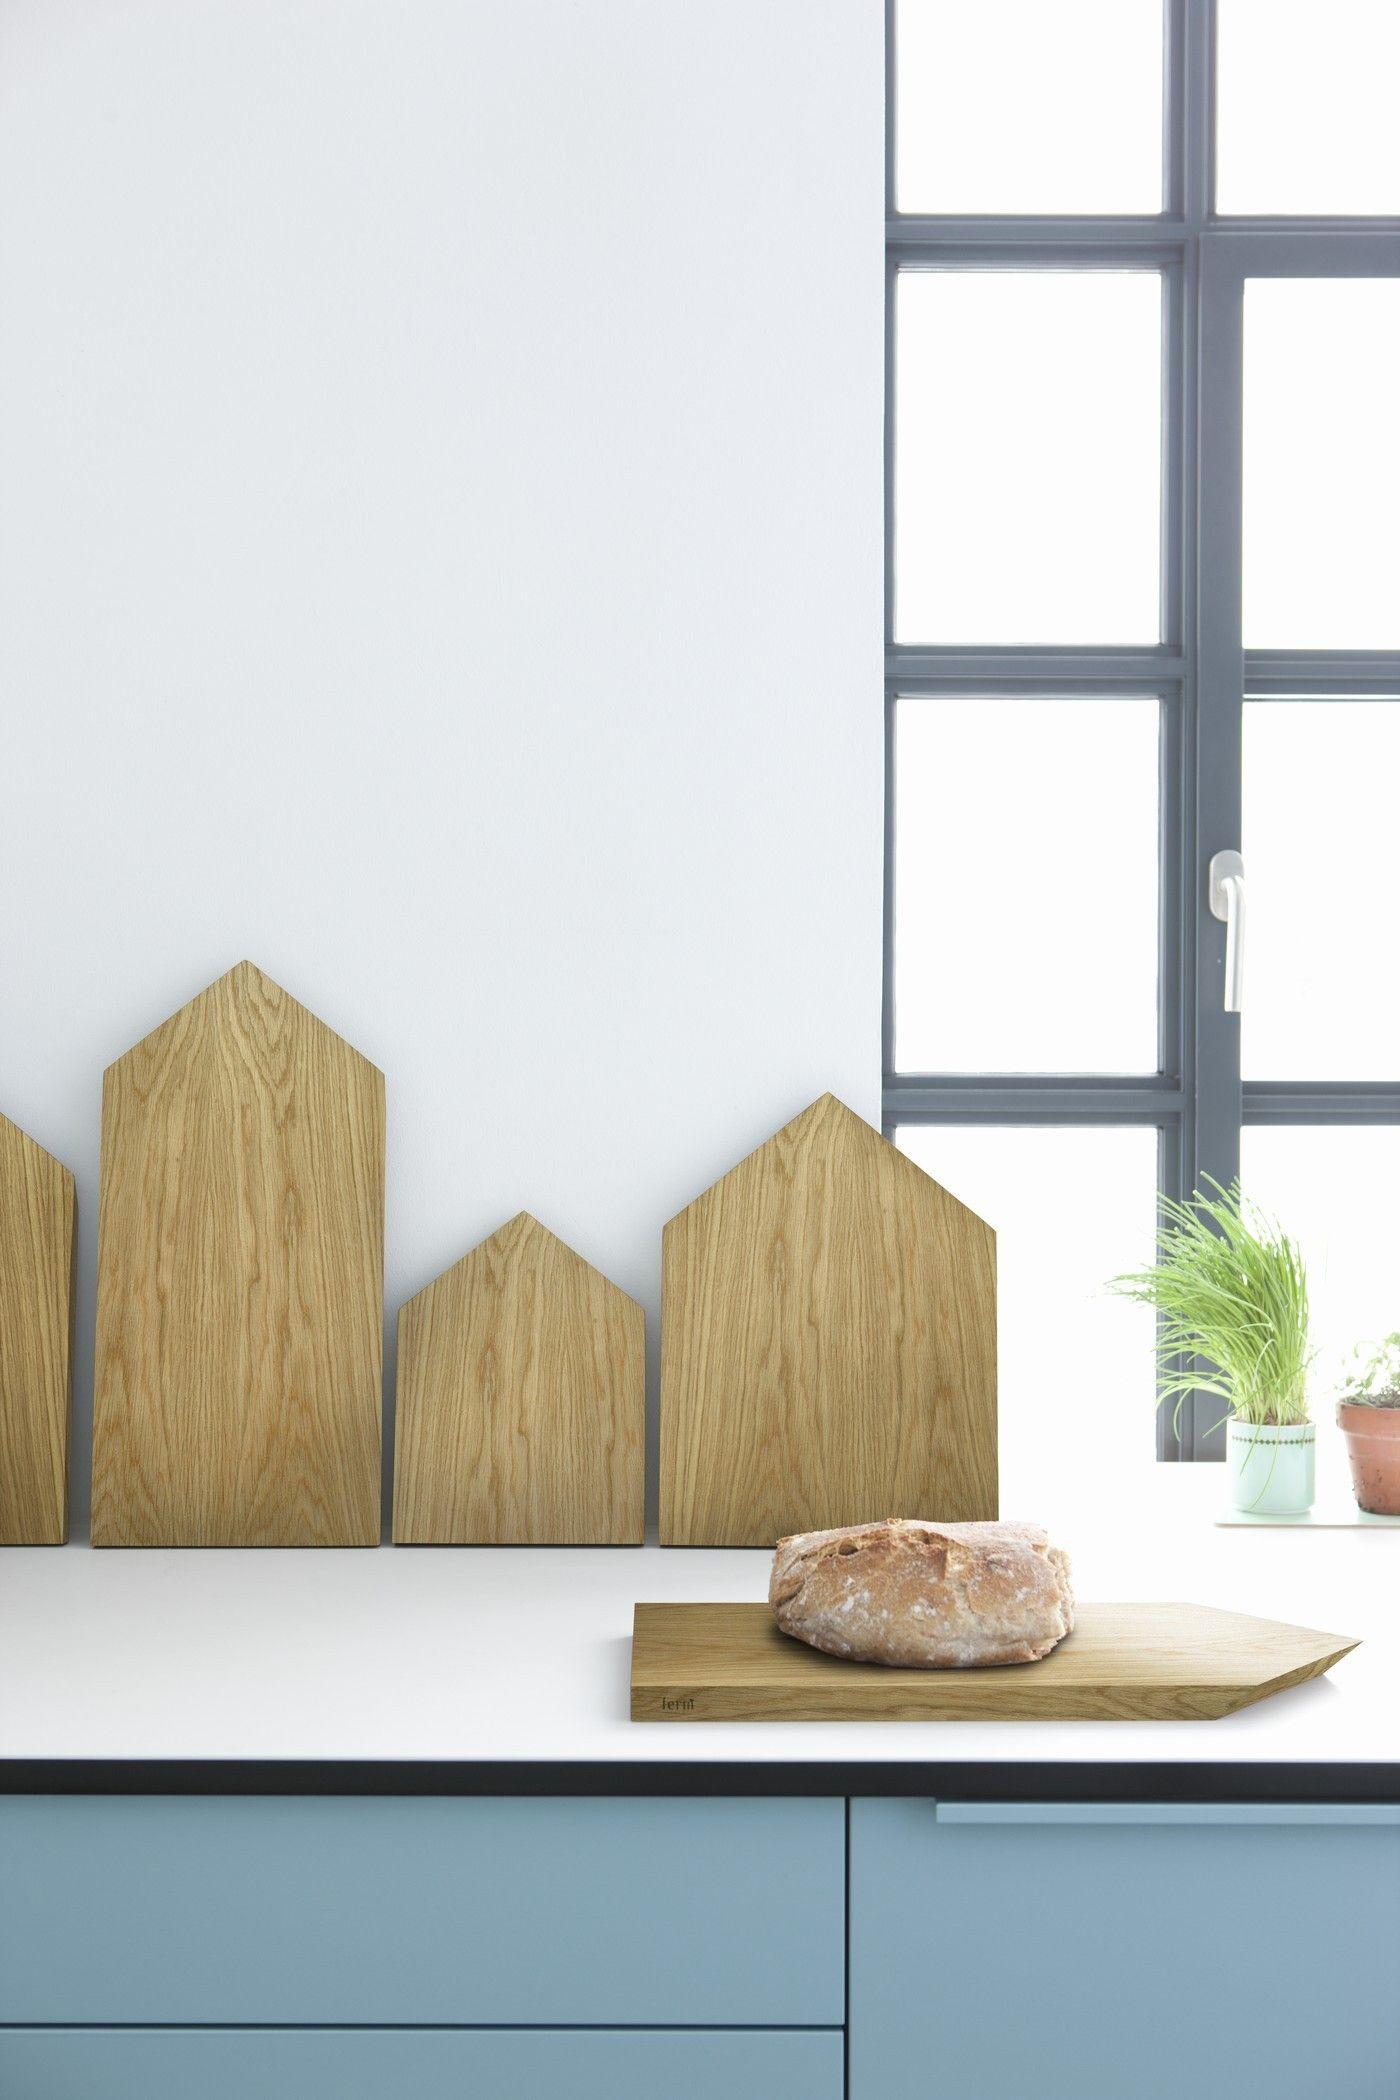 cutting board 1 18 5 x 25 cm ferm living schneidebrett. Black Bedroom Furniture Sets. Home Design Ideas